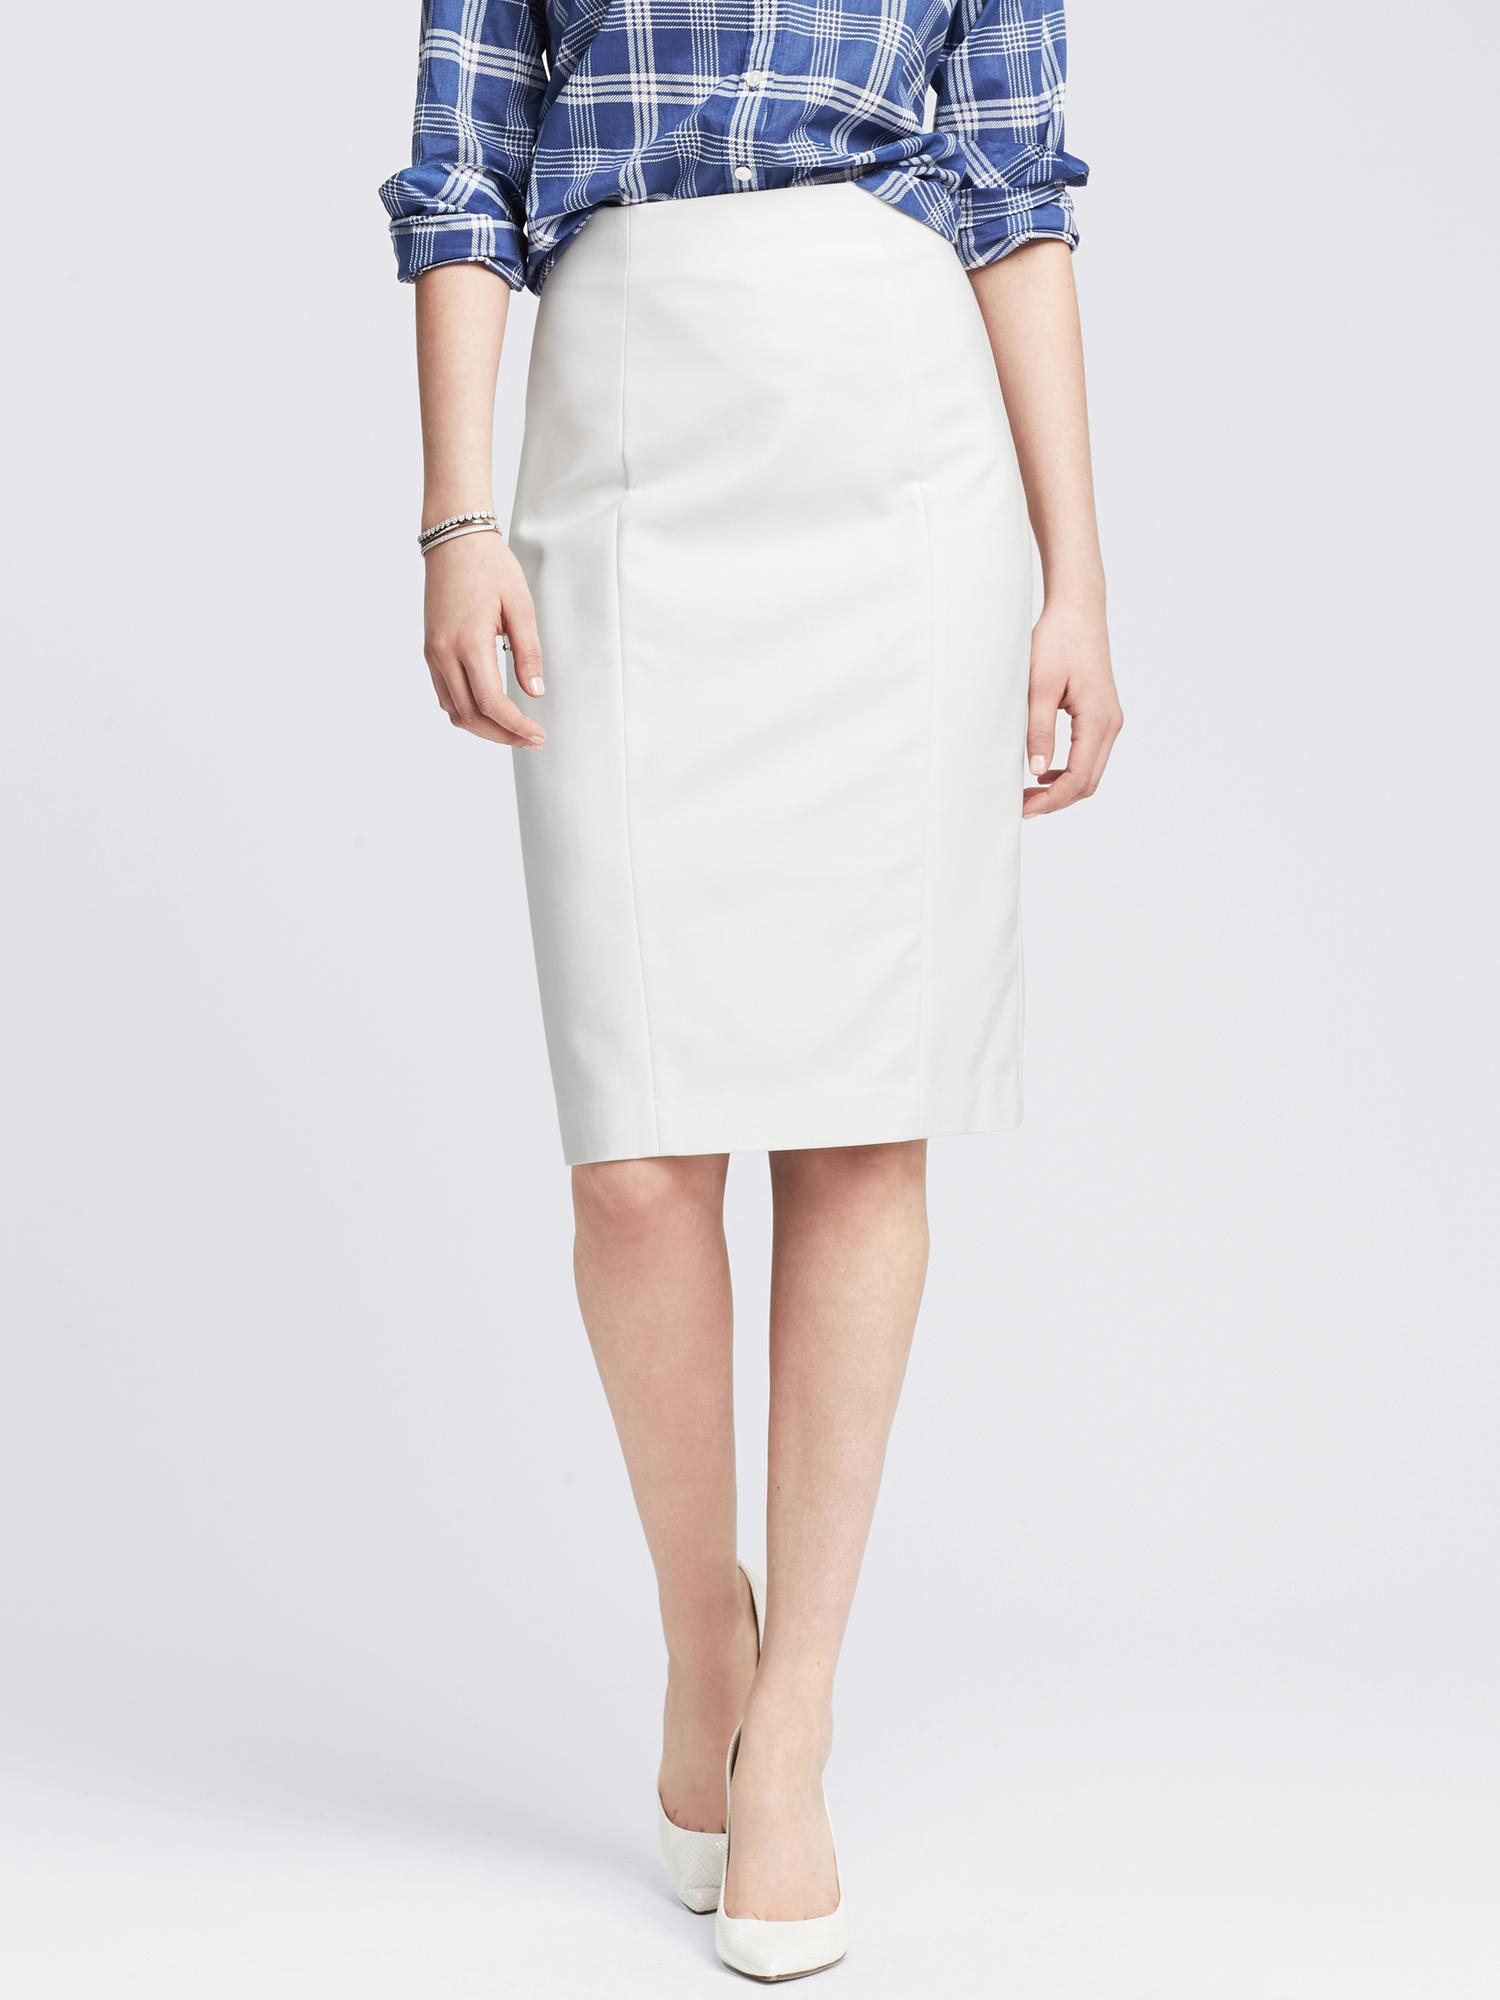 76bd6ed01e Banana Republic Sleek Suit Pencil Skirt in White - Lyst